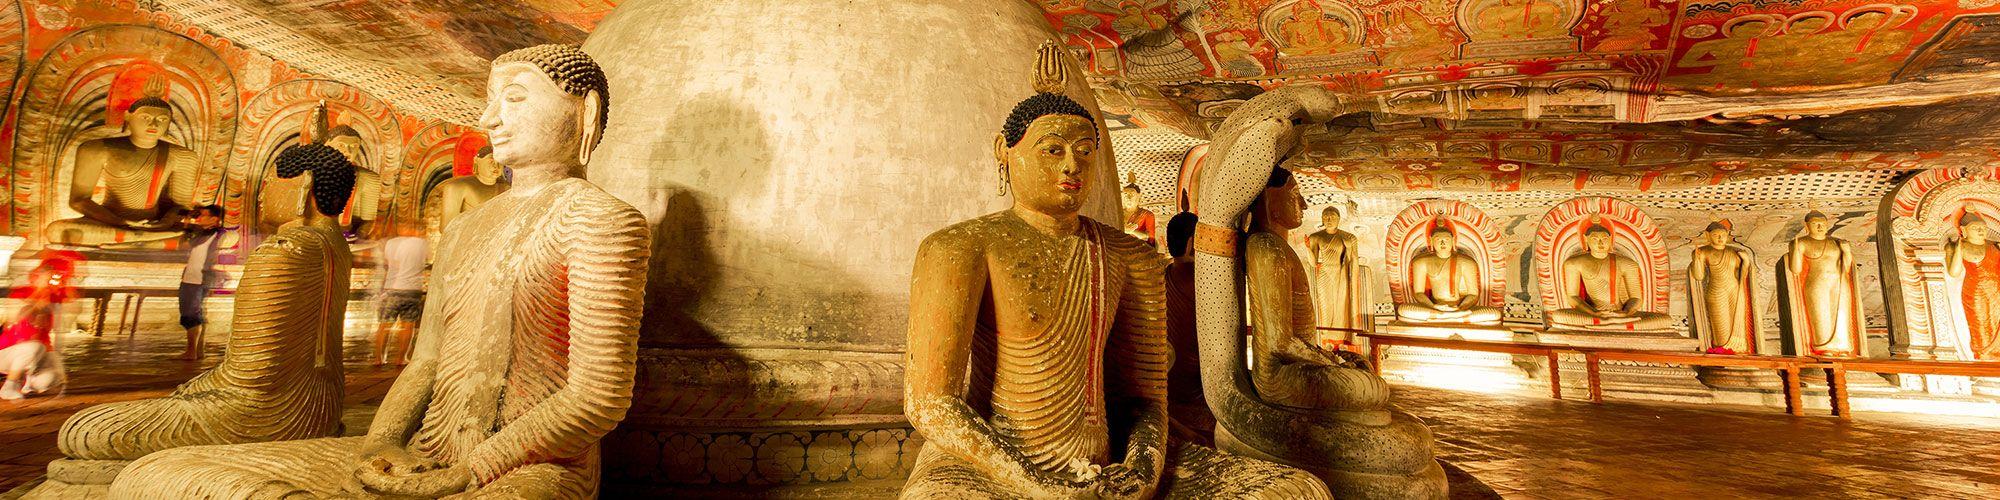 Sri Lanka, Dambulla, Caves